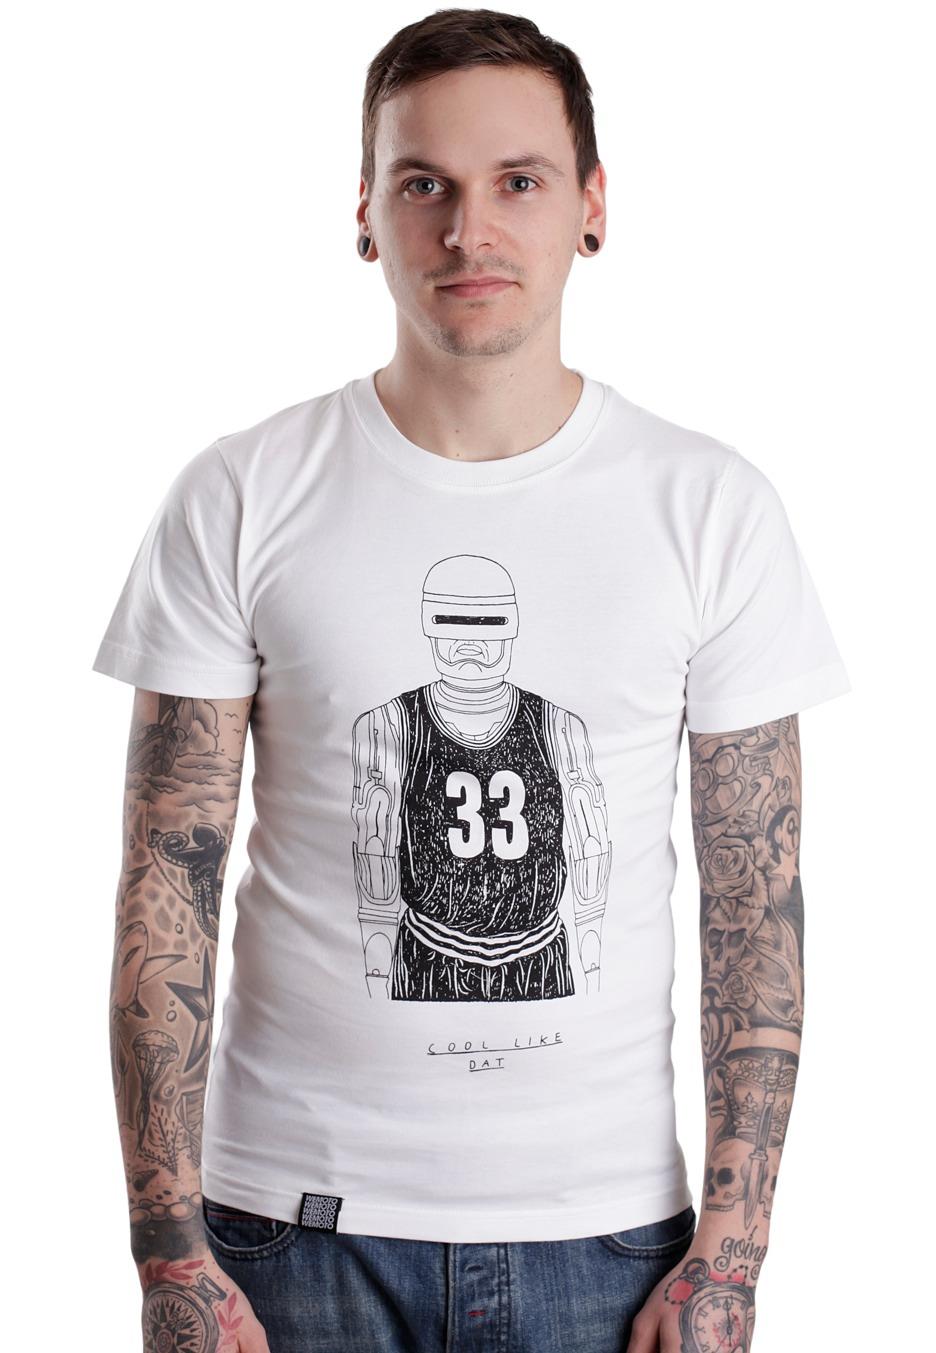 Cool White Shirts